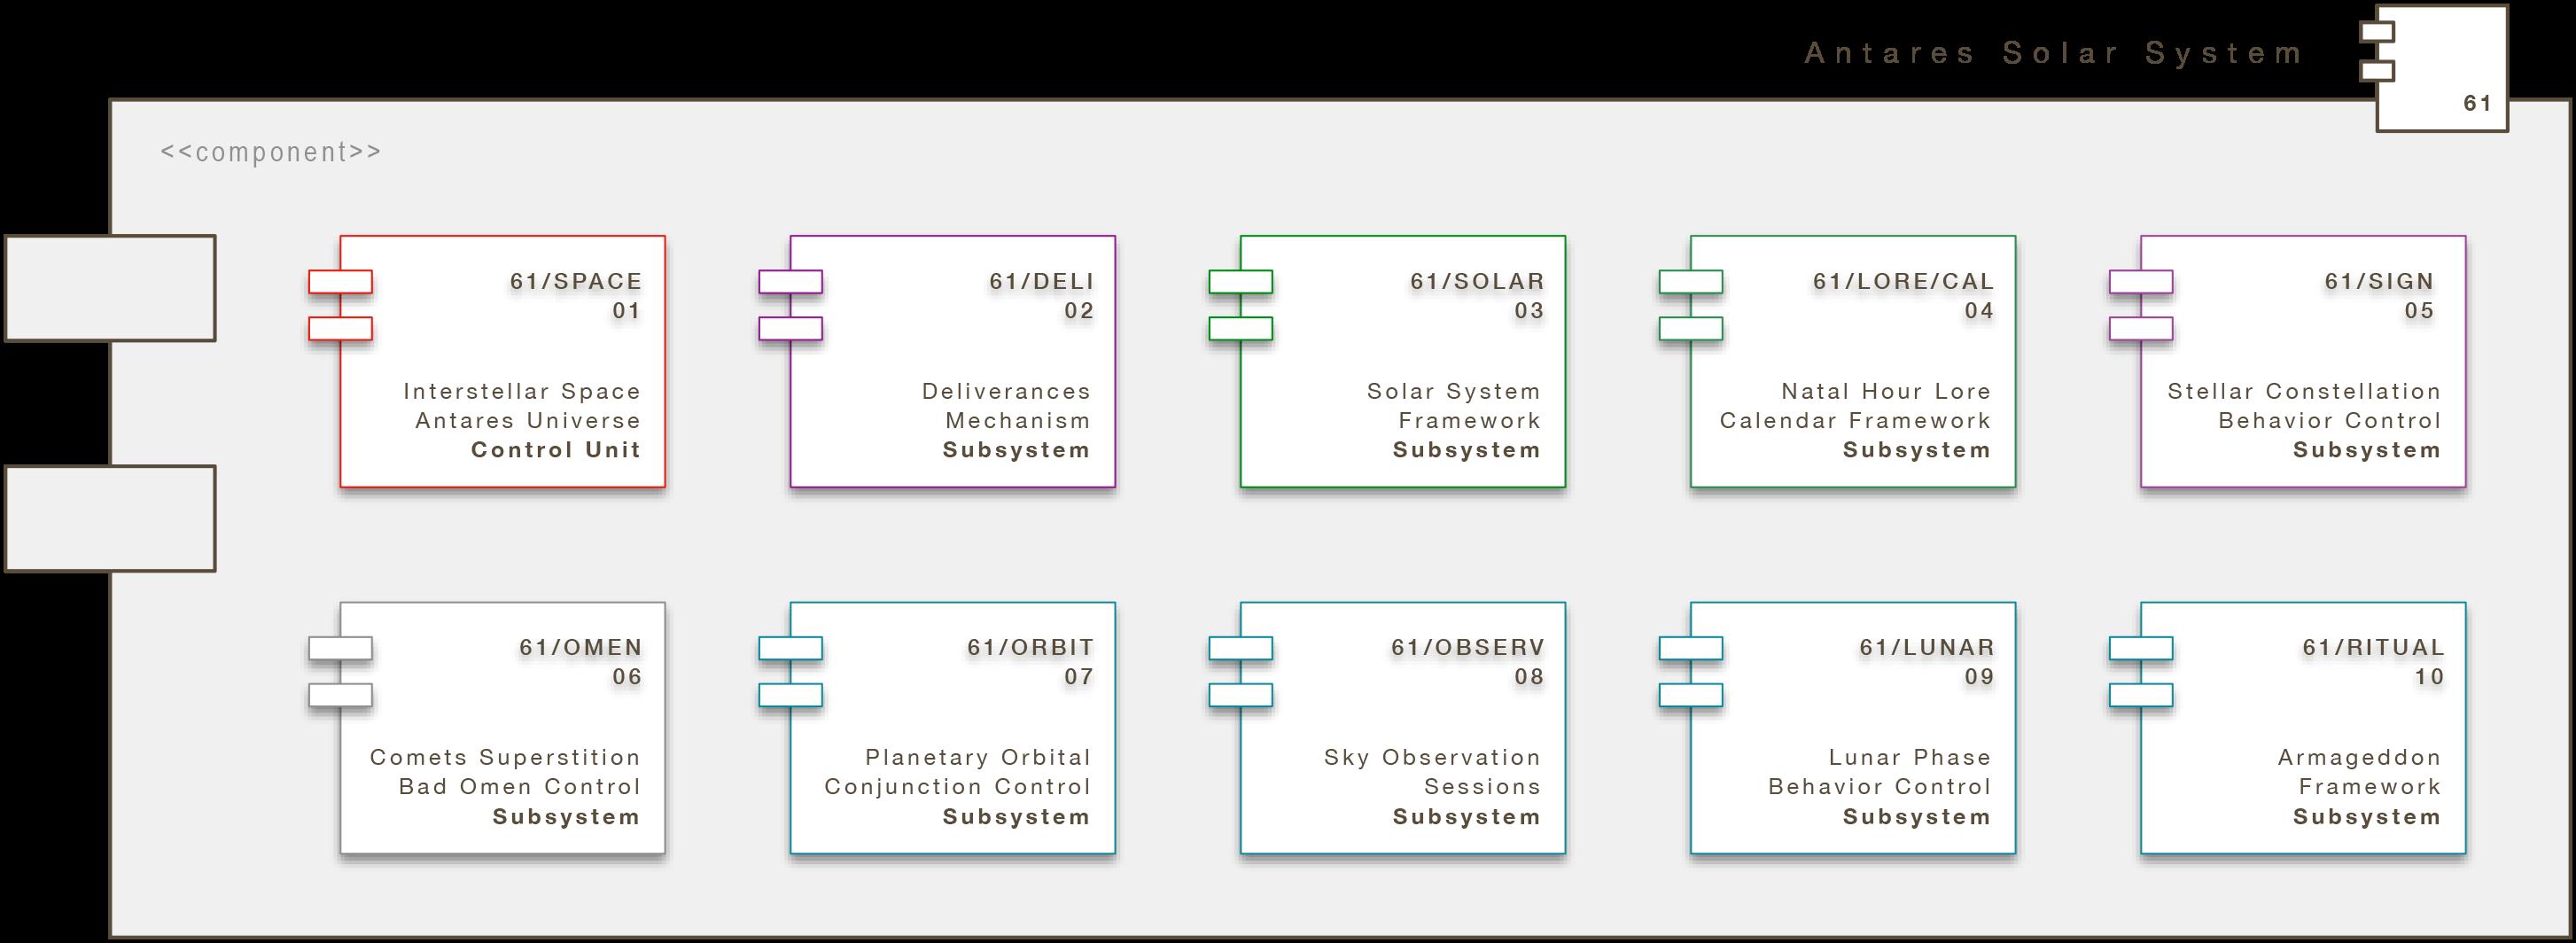 Core Engine Modul: Antares Solar System (A/SOLAR)